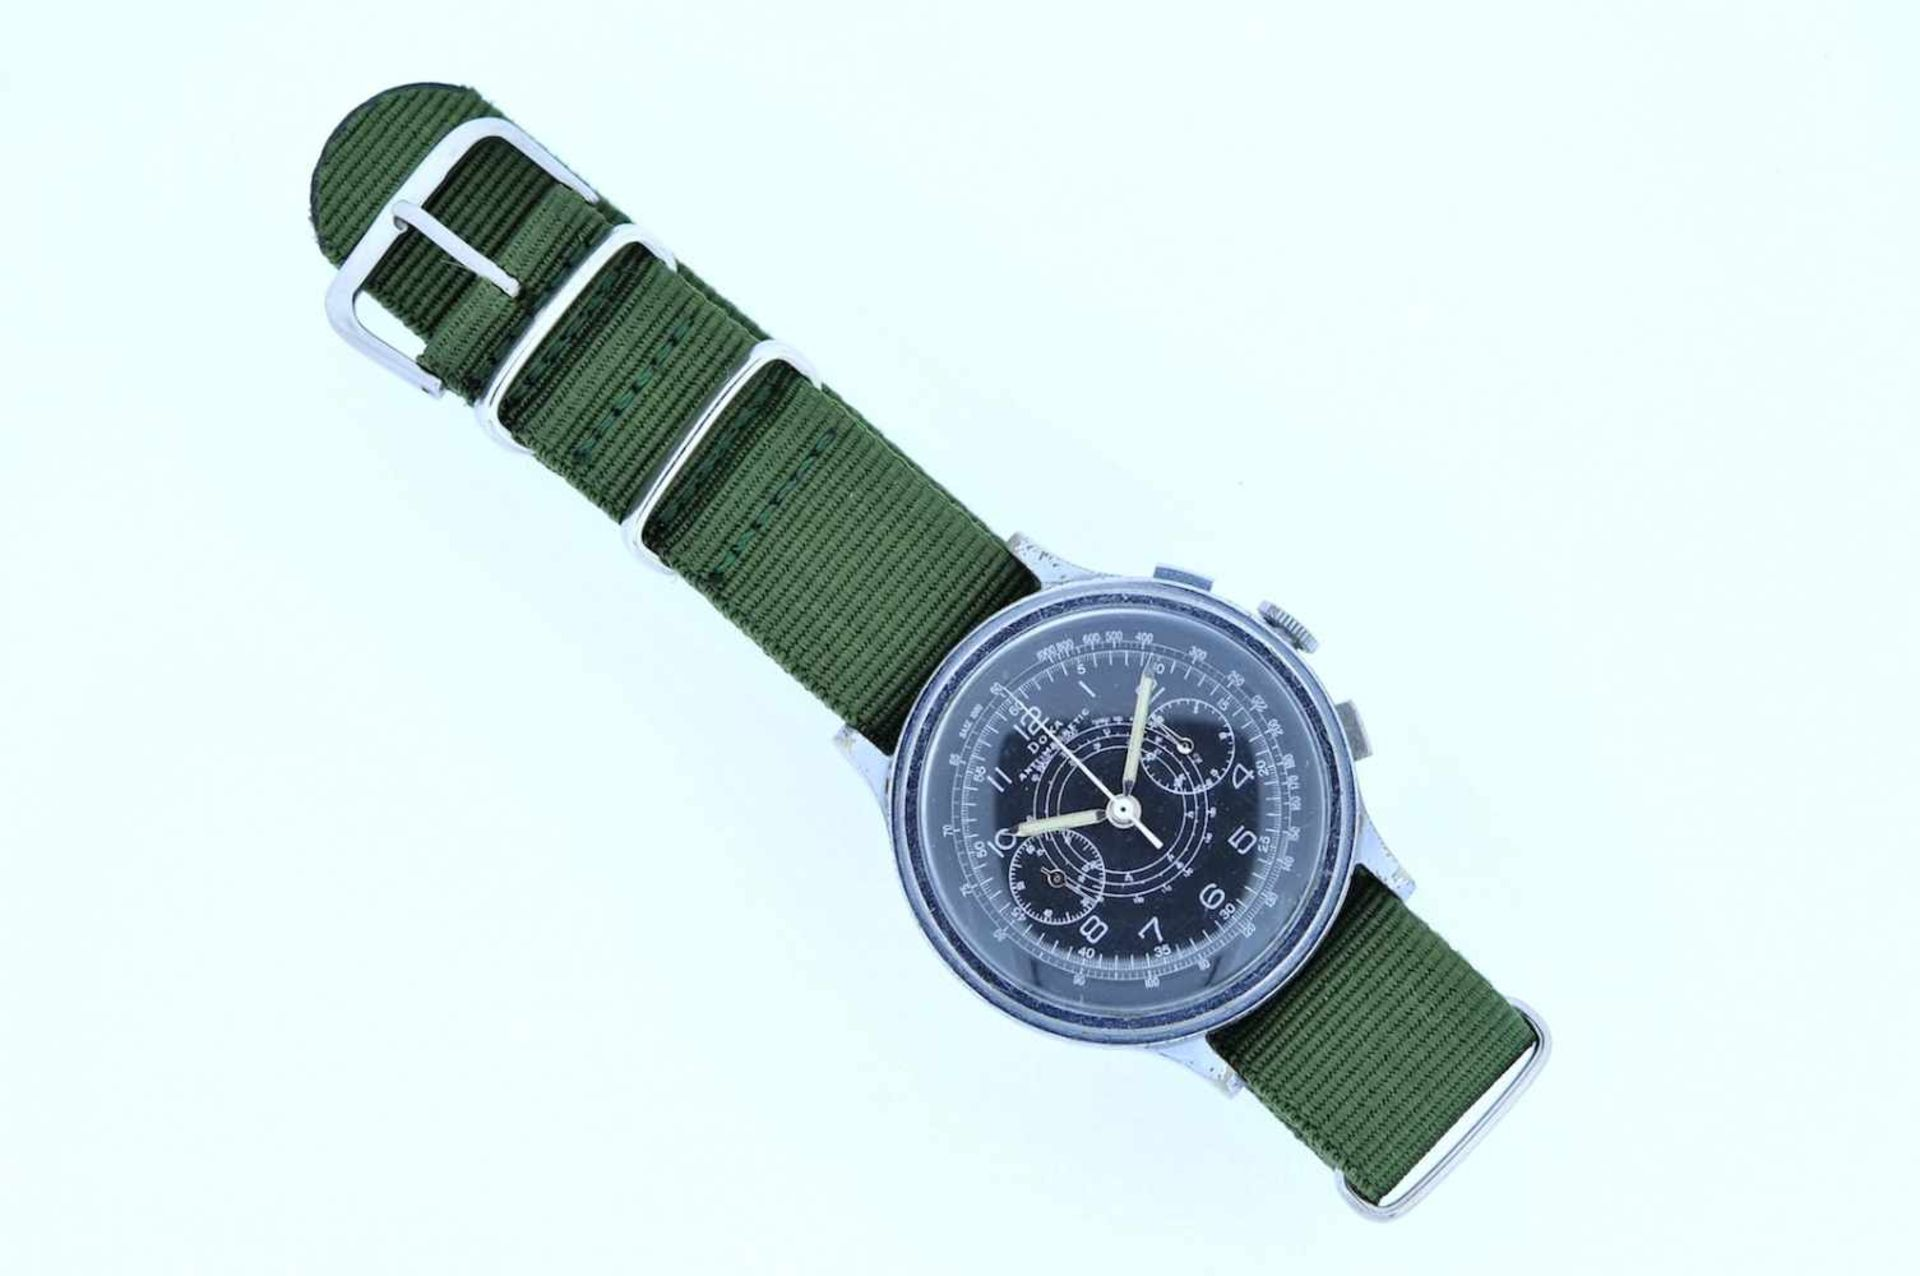 Los 19 - Doxa Edelstahl Armbanduhr an Textilband, Doxa Anti-Magnetic, Fliegerchronograph, Stoppfunktion,